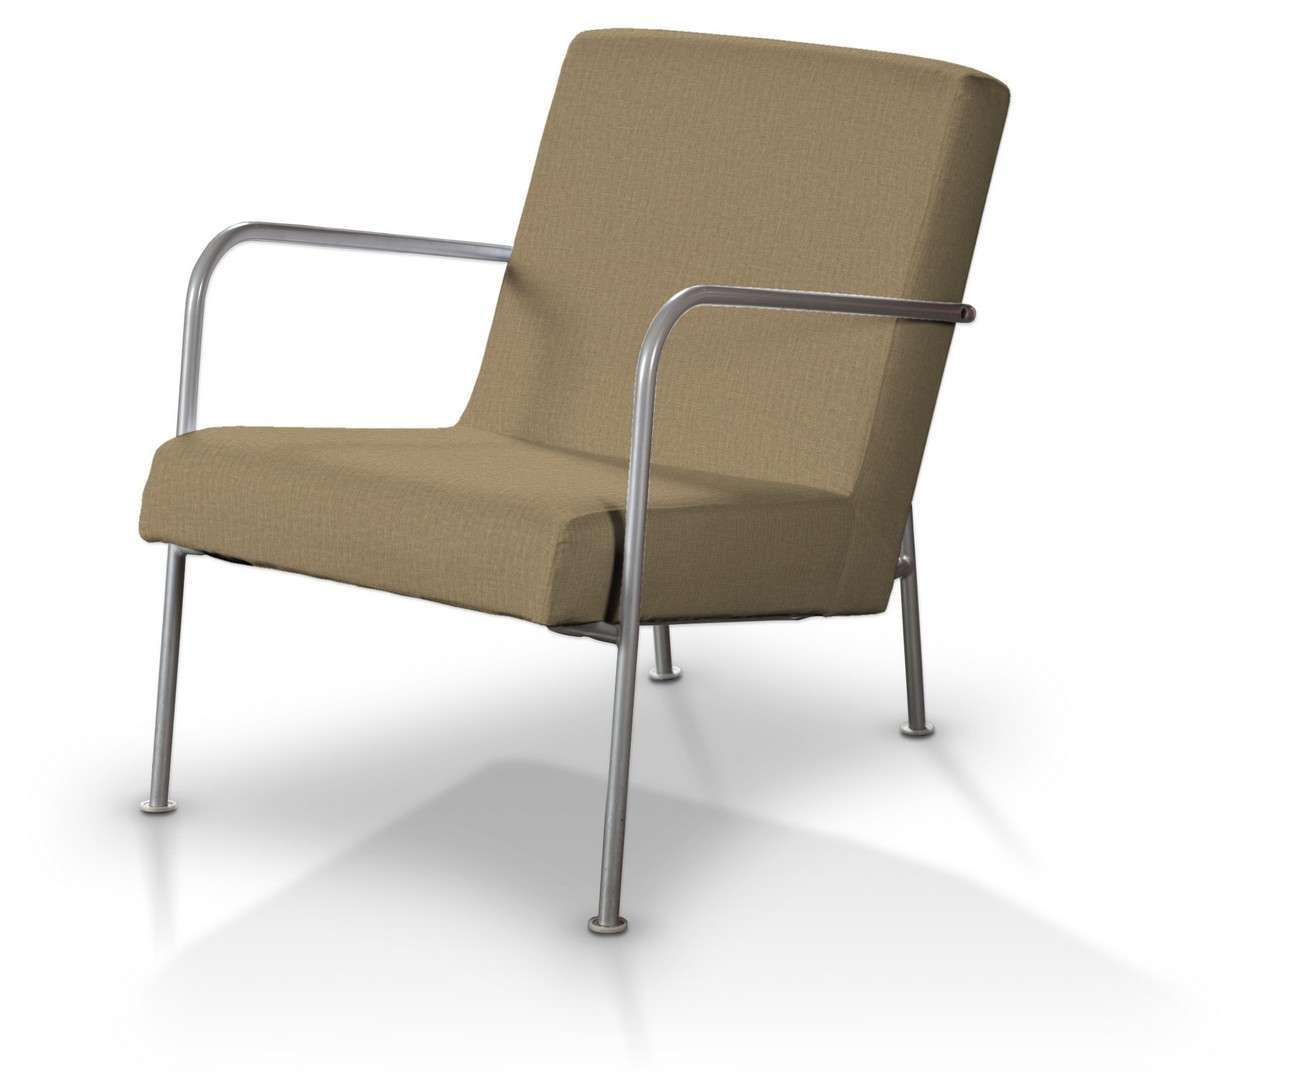 Potah na křeslo Ikea PS v kolekci Living, látka: 161-50